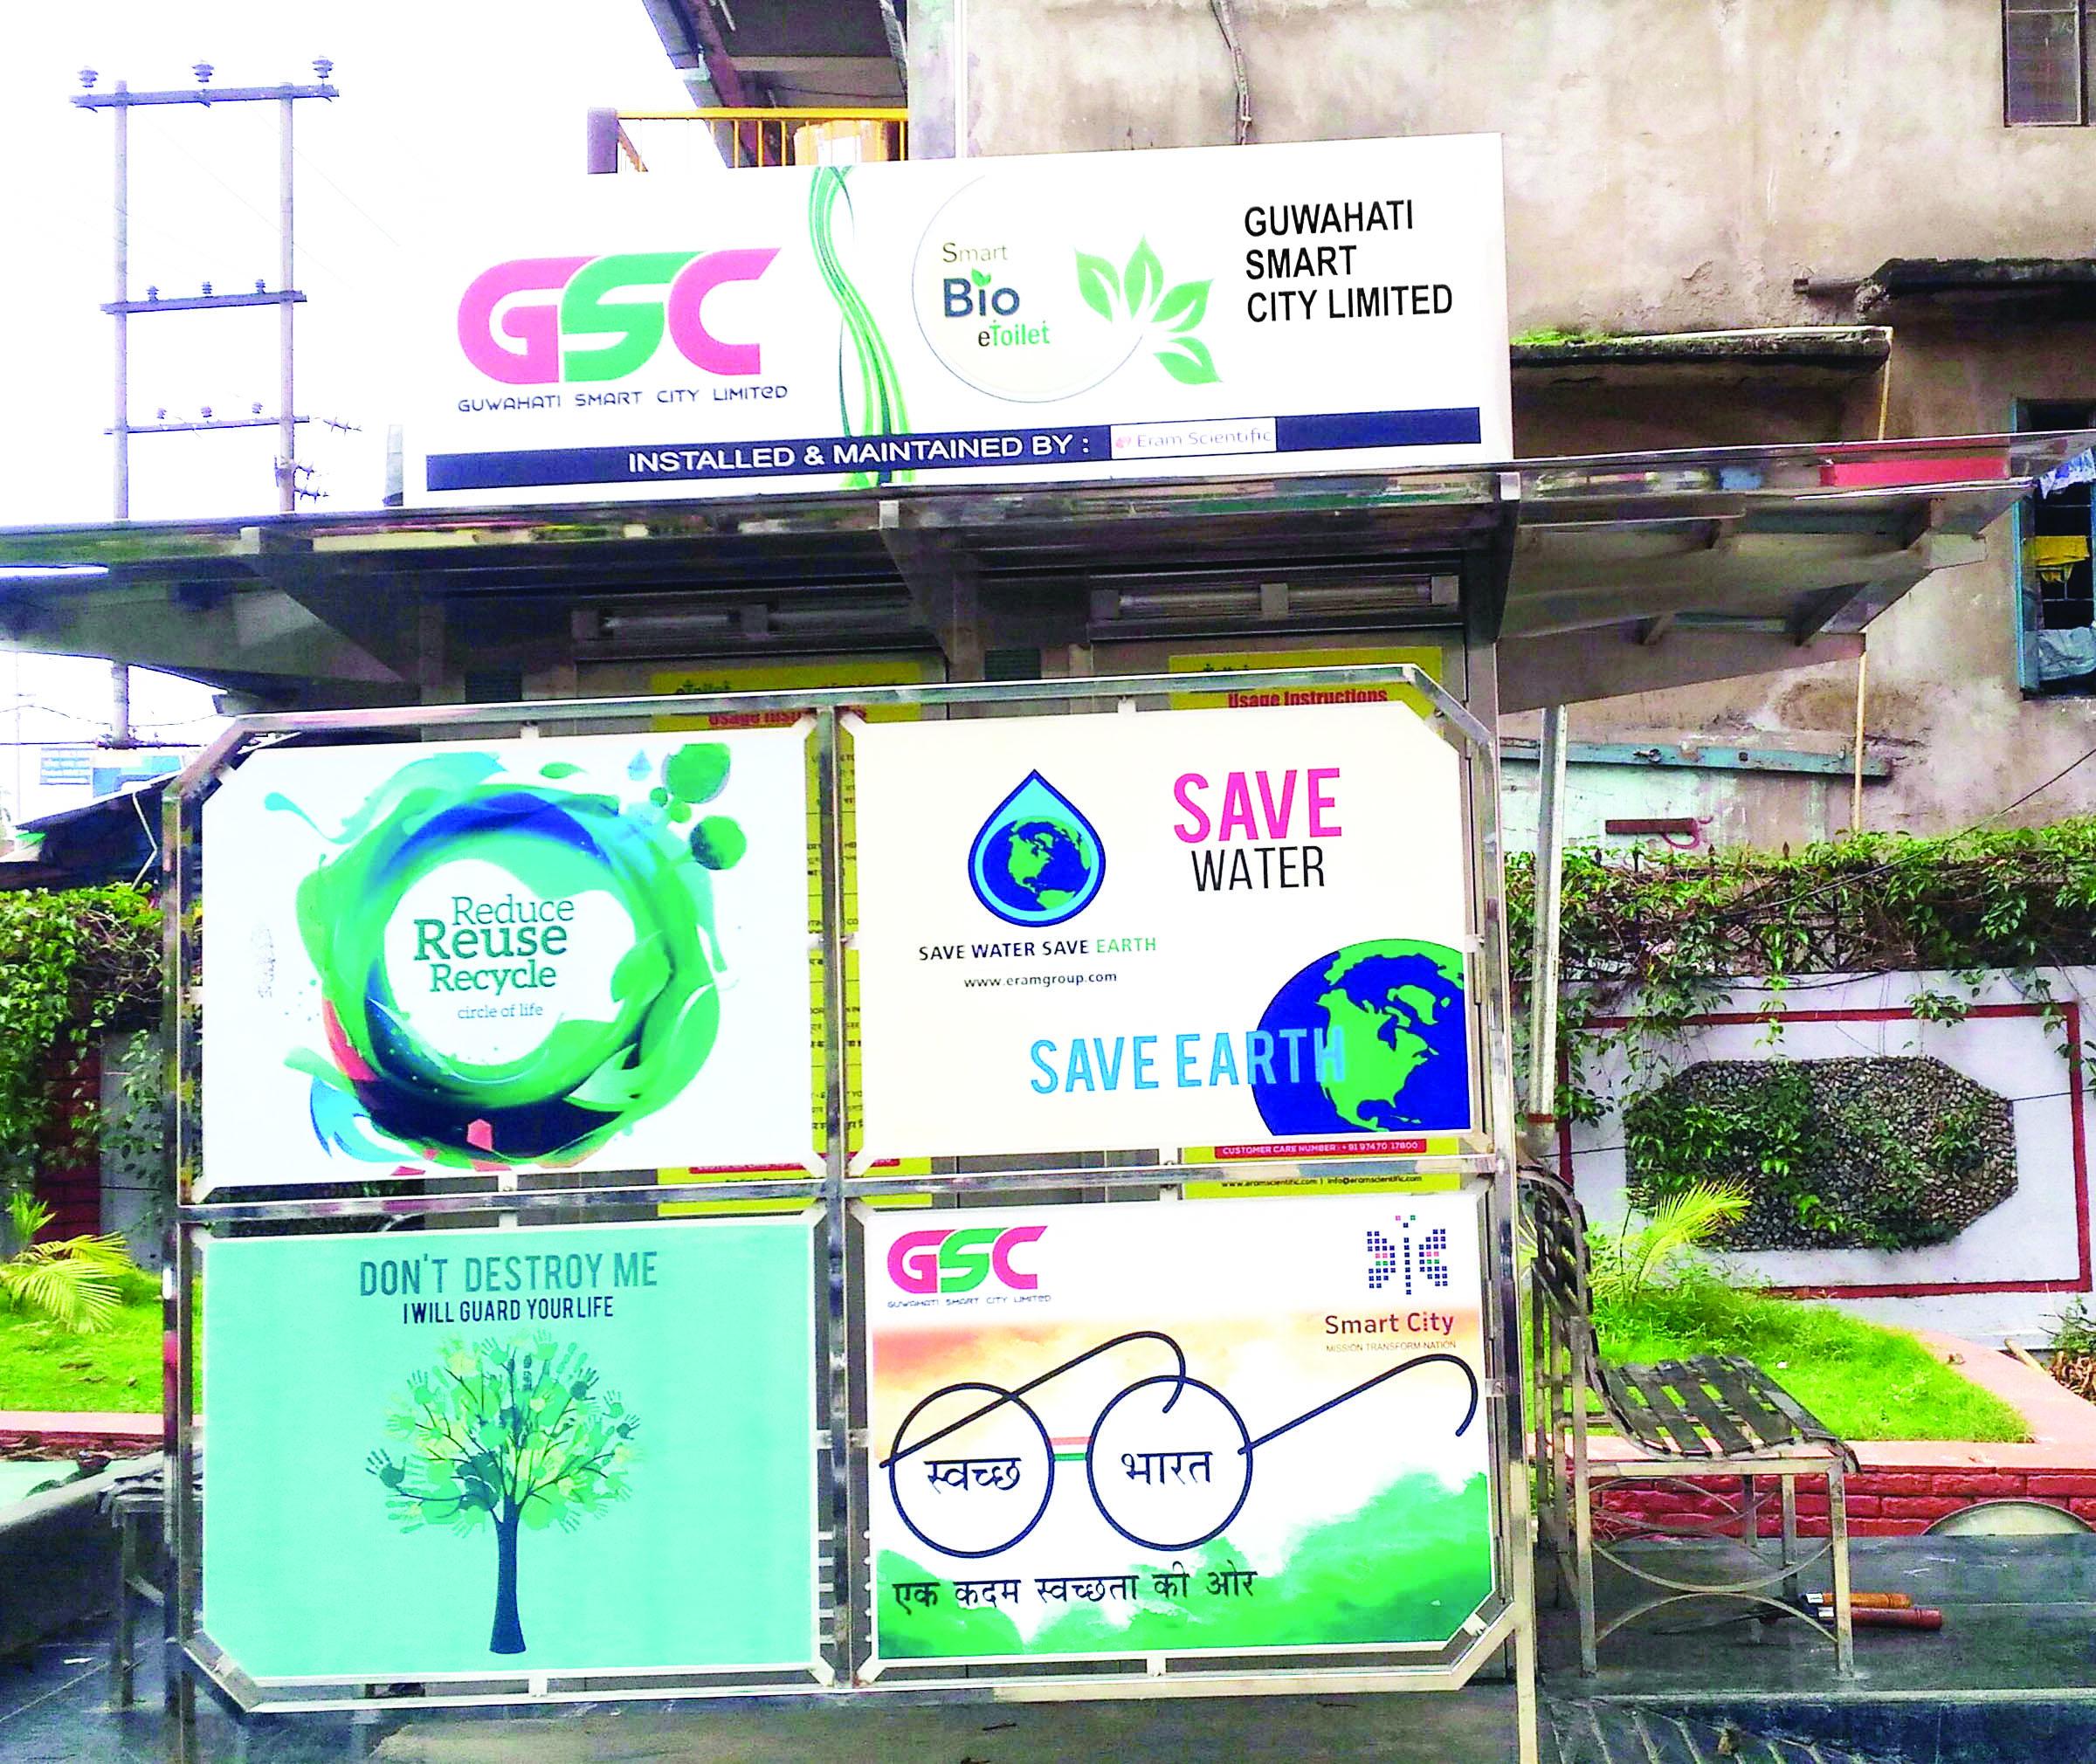 Smart bio toilets way behind deadline